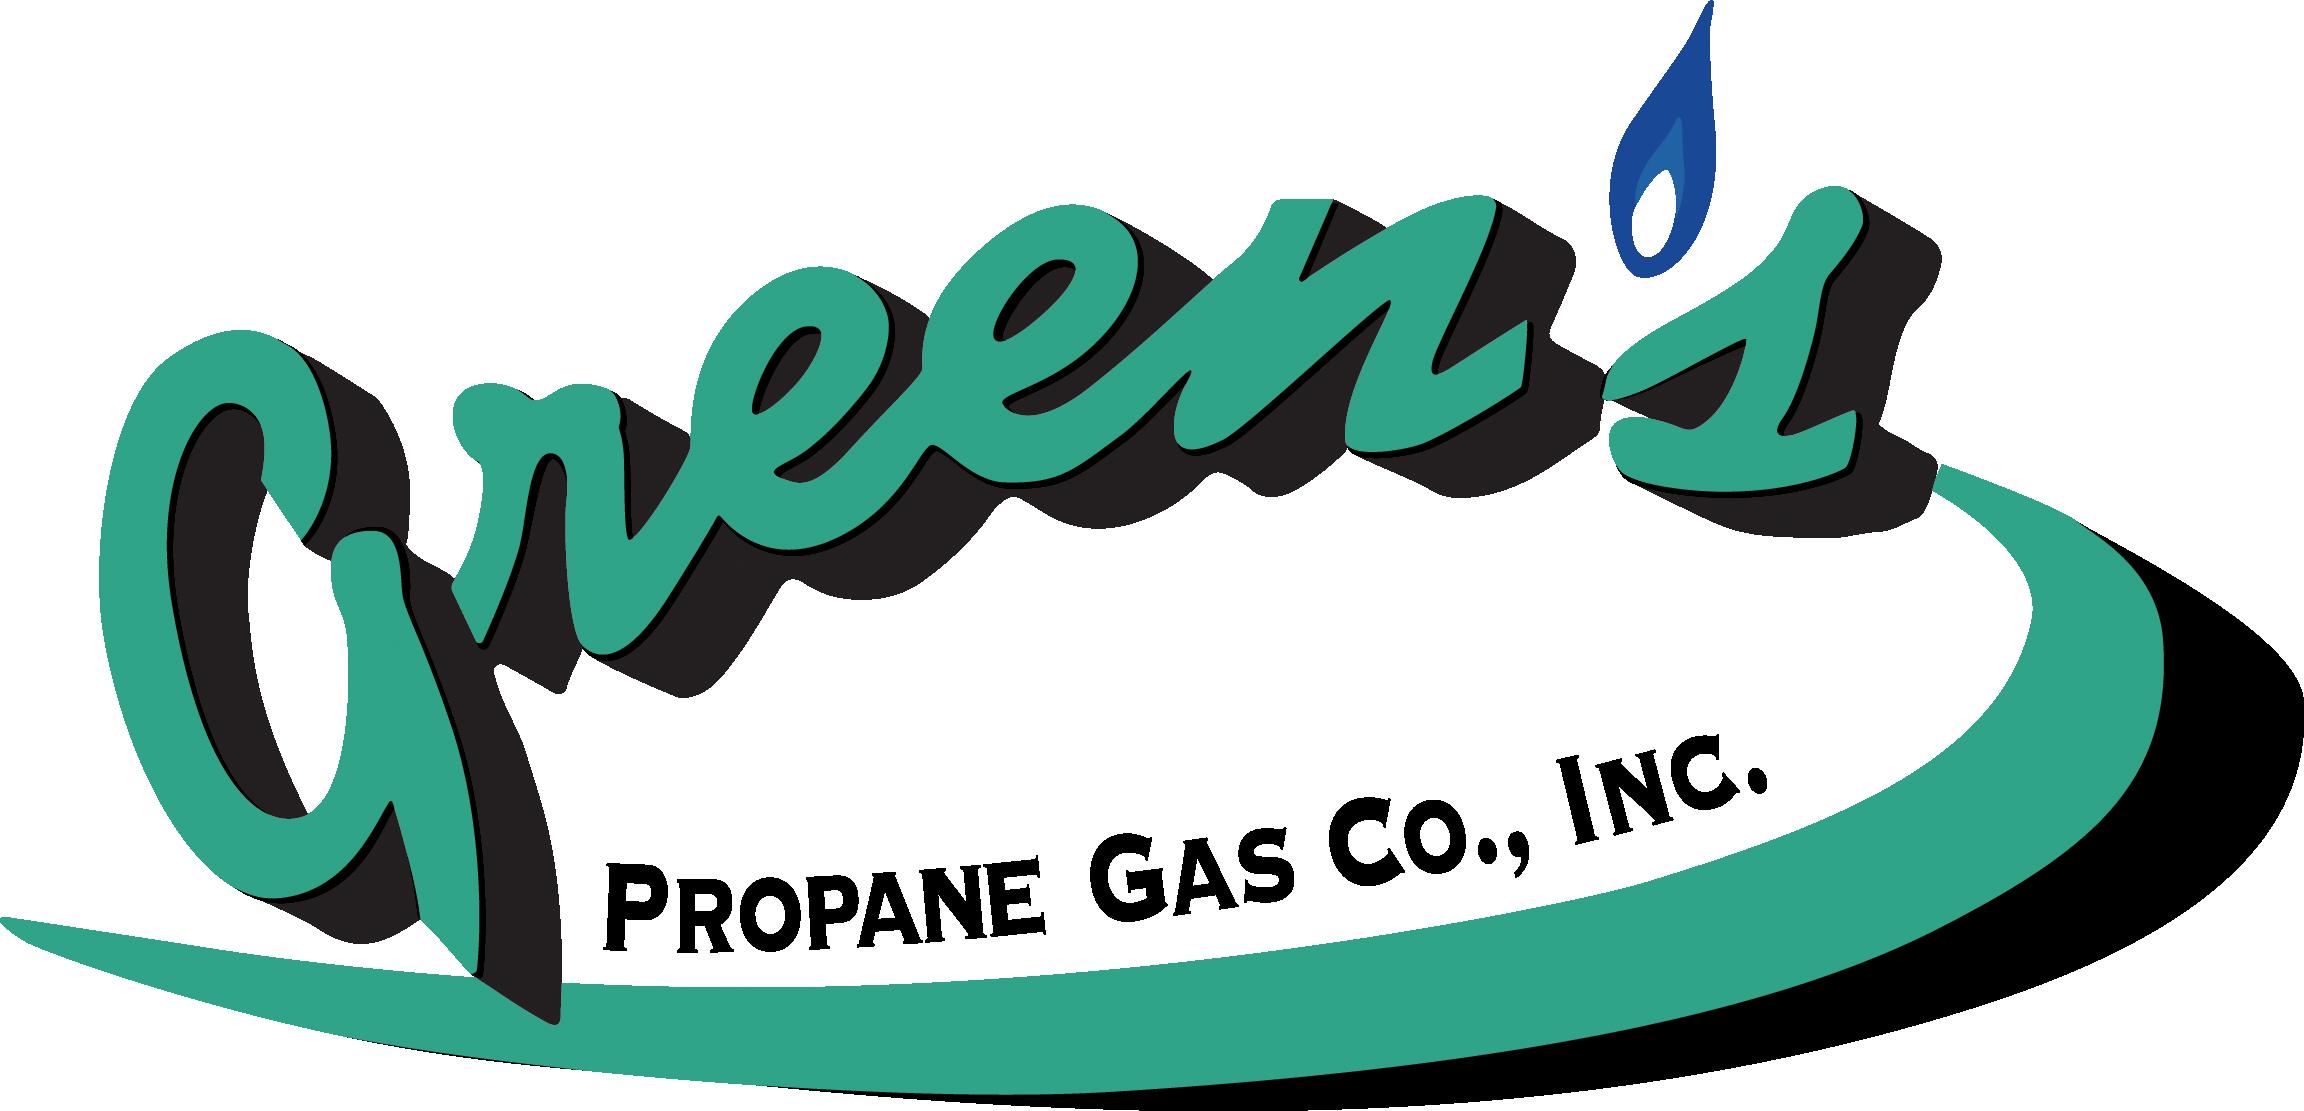 Green's Propane Gas Co., Inc